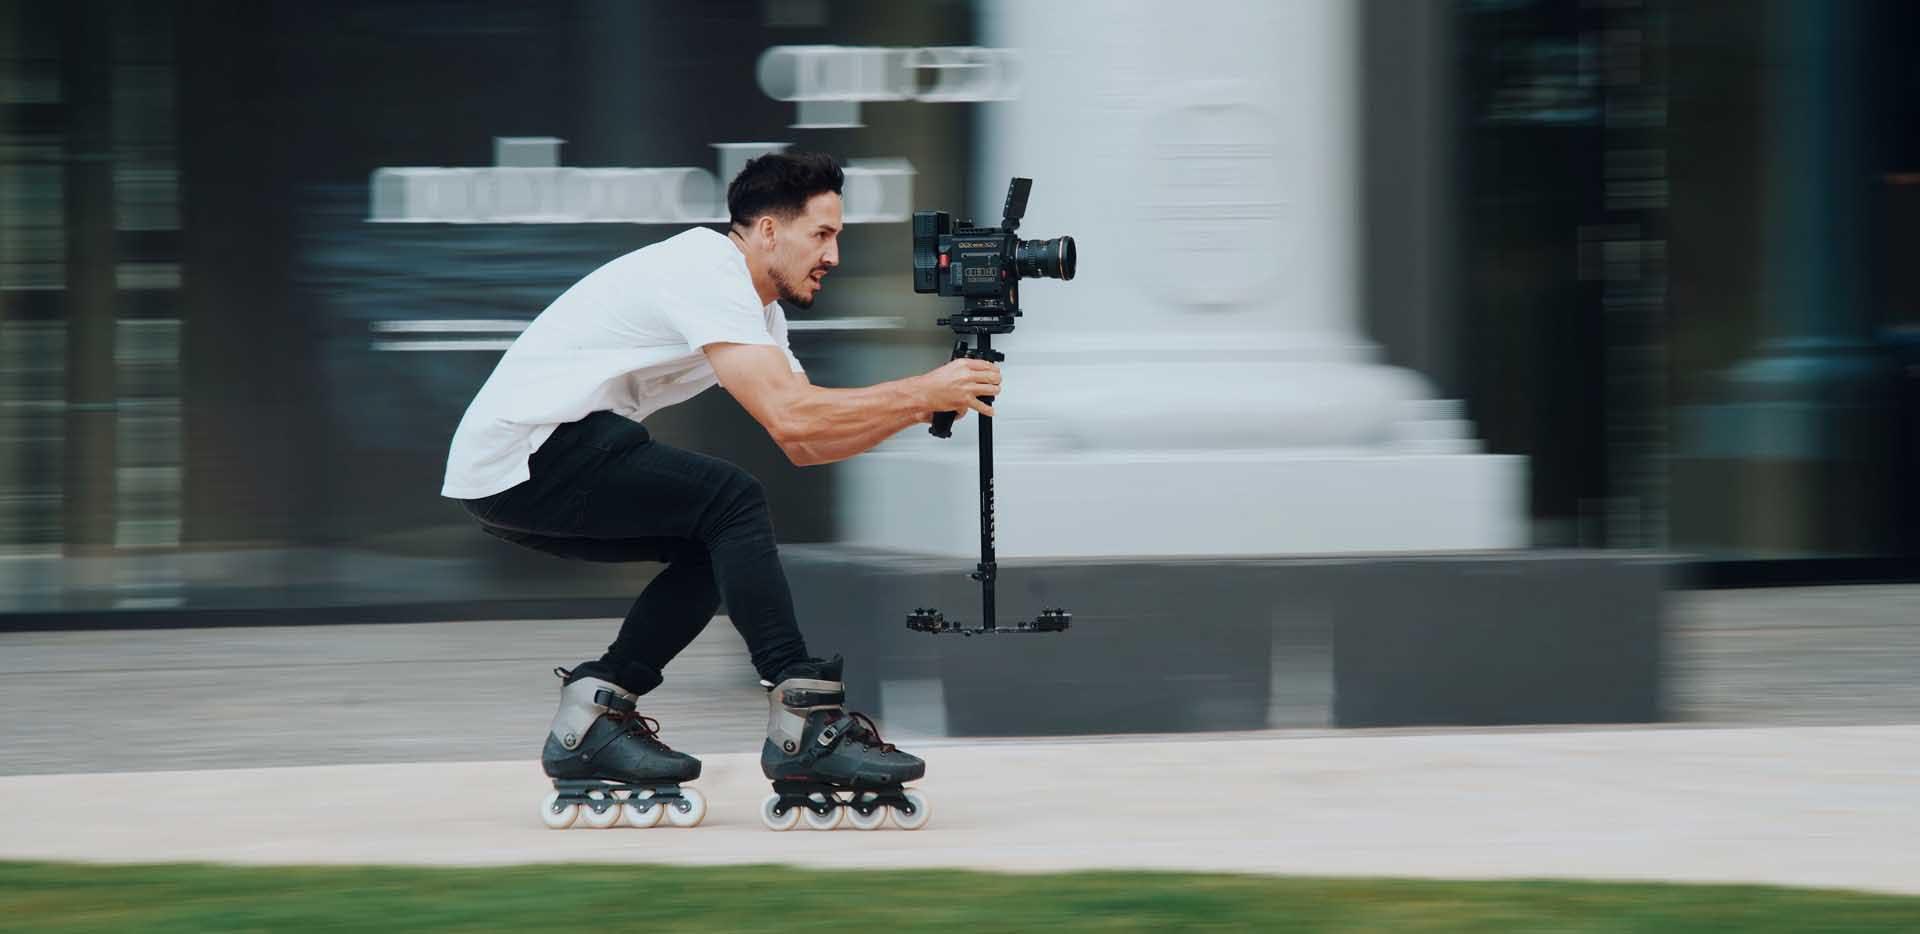 rollerblading camera